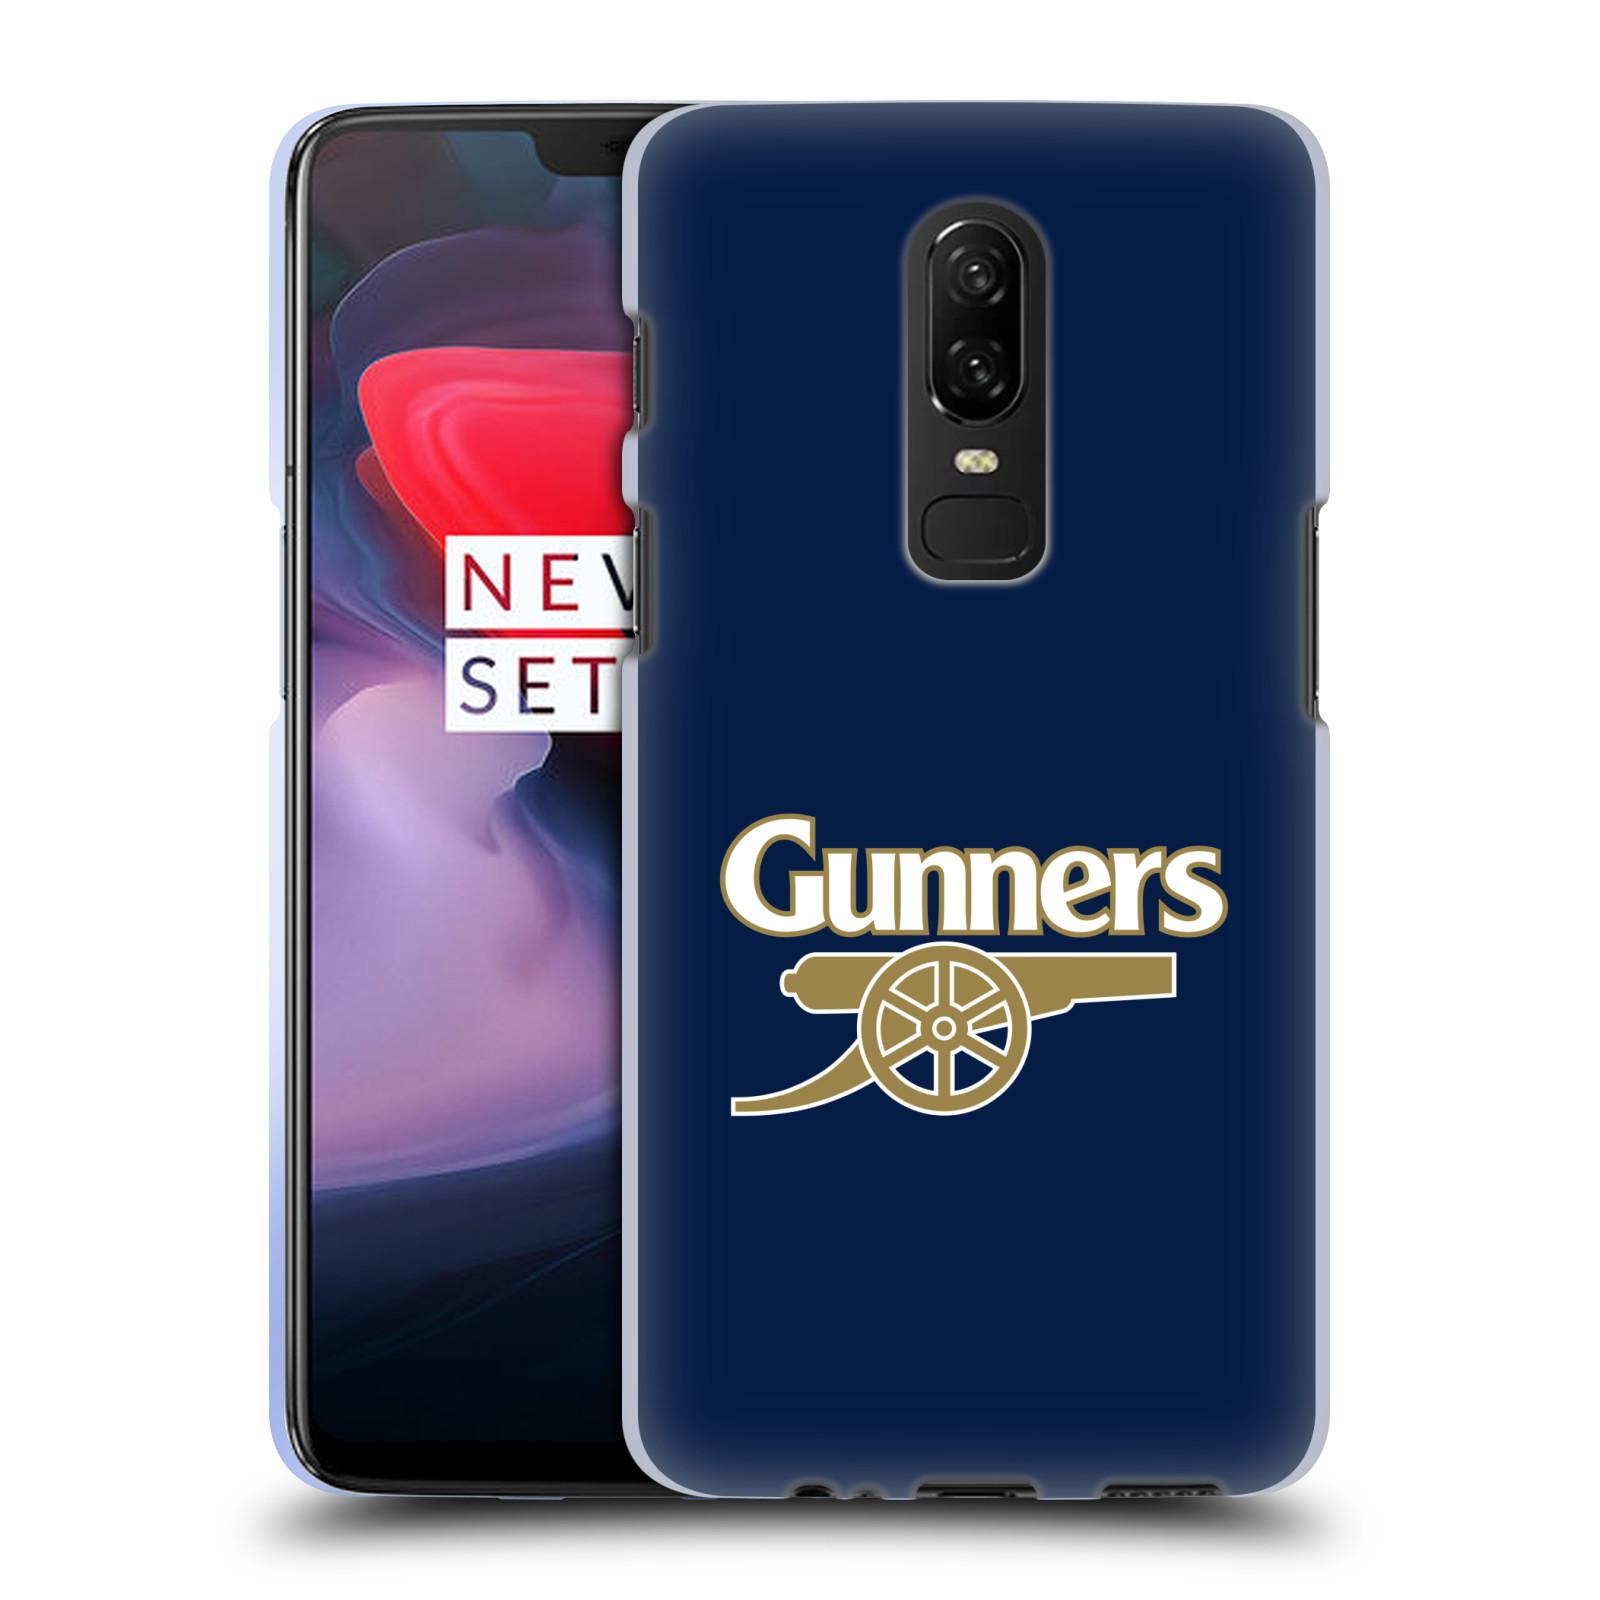 Silikonové pouzdro na mobil OnePlus 6 - Head Case - Arsenal FC - Gunners